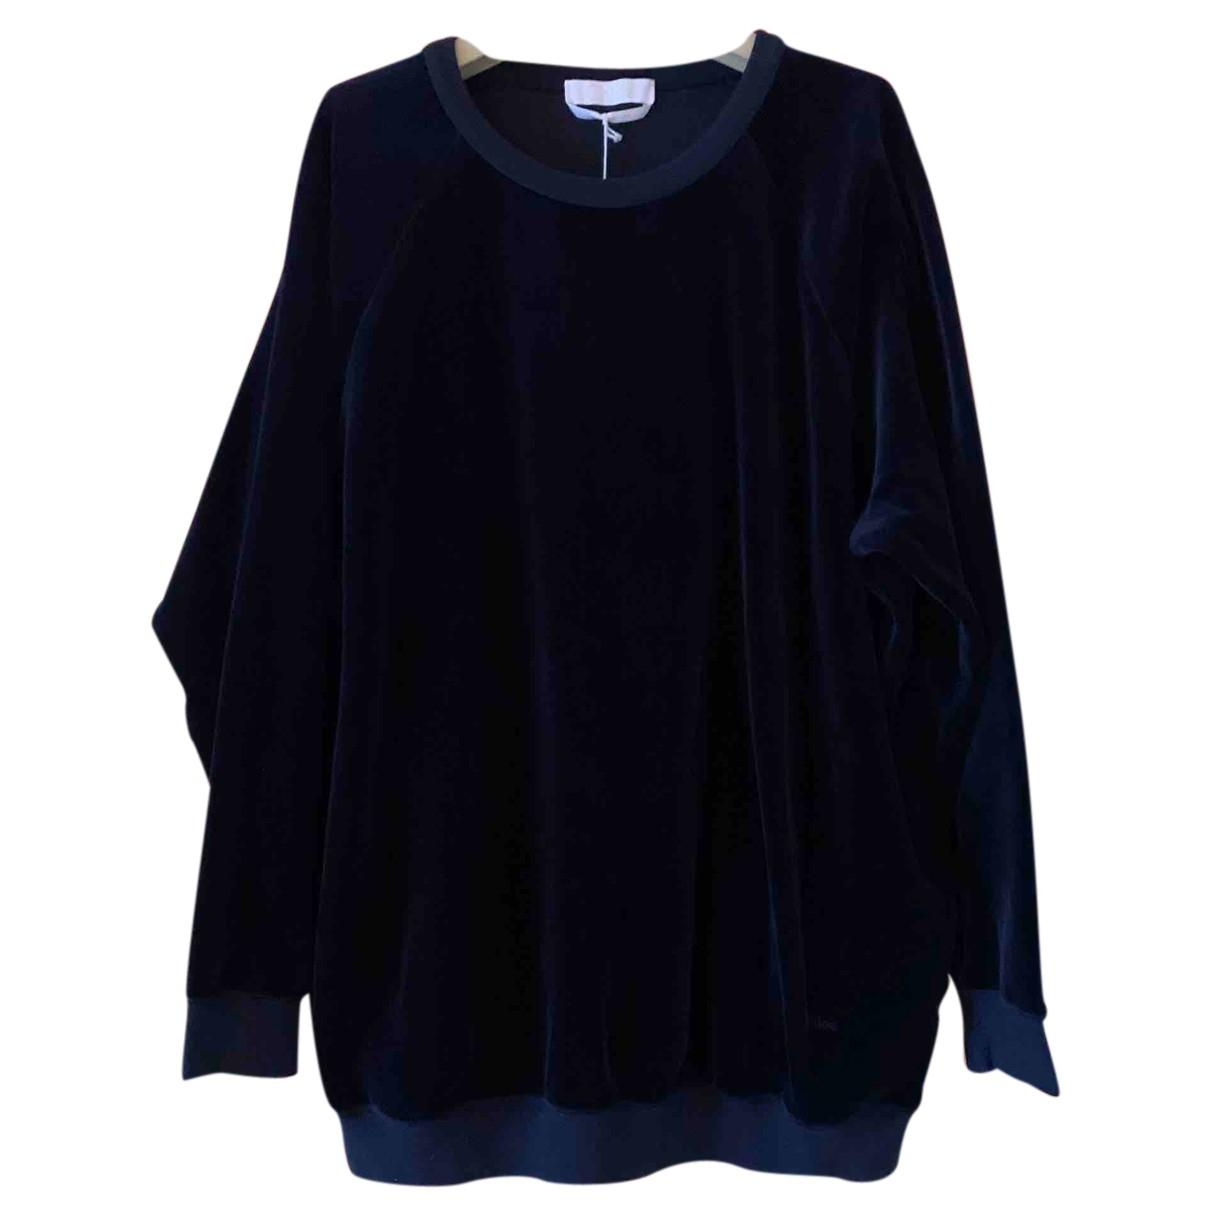 Chloé N Blue Cotton Knitwear for Women M International